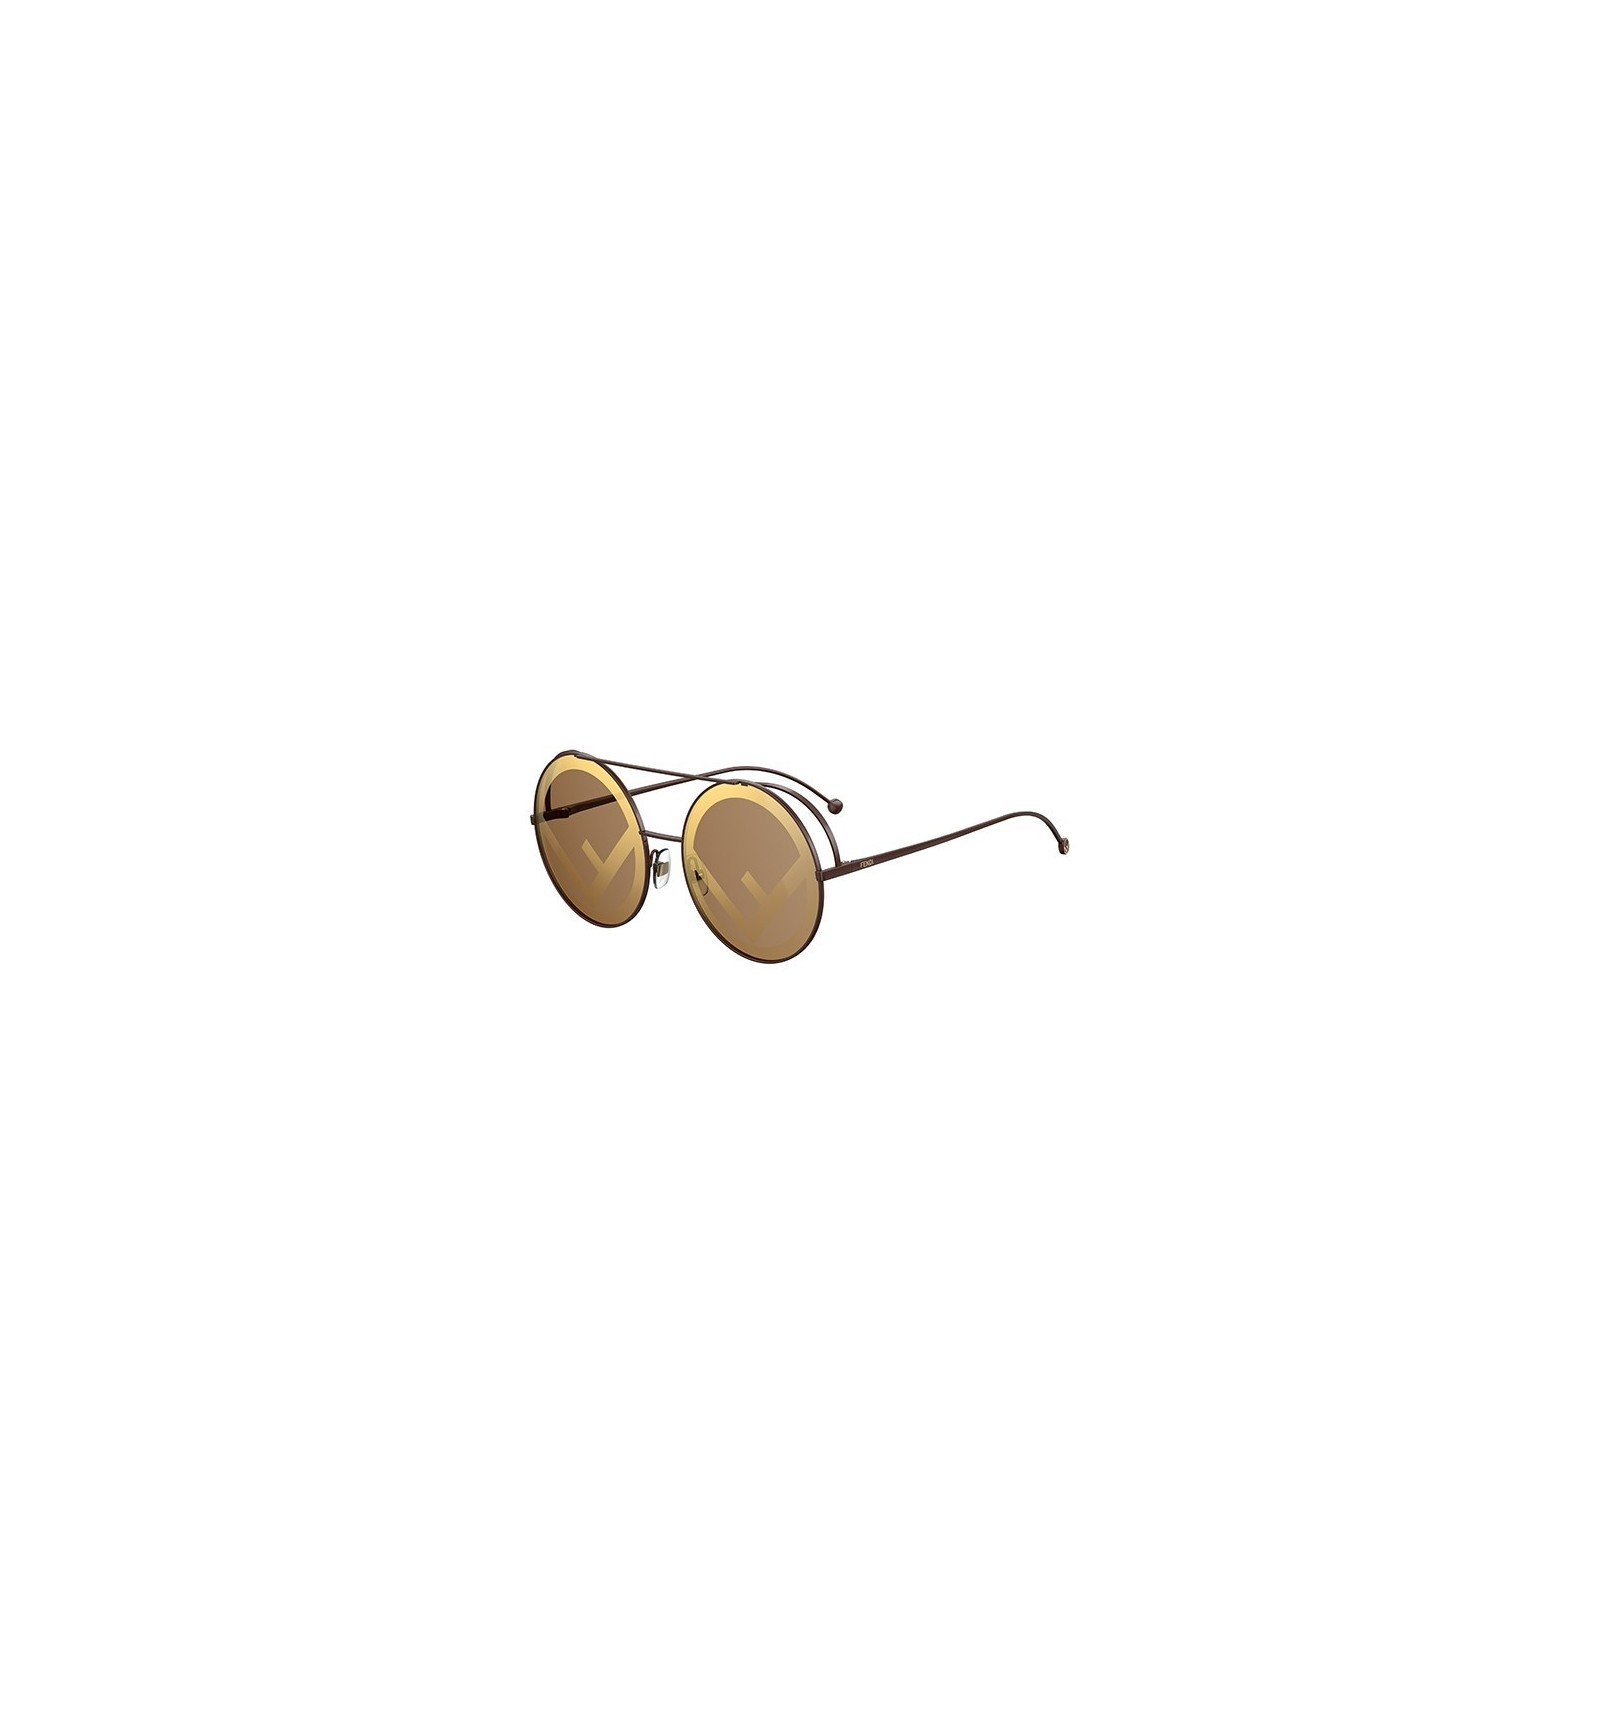 1237d9aab2 Gafas de sol Fendi Run Away Brown - Brown Gold. Compra Online